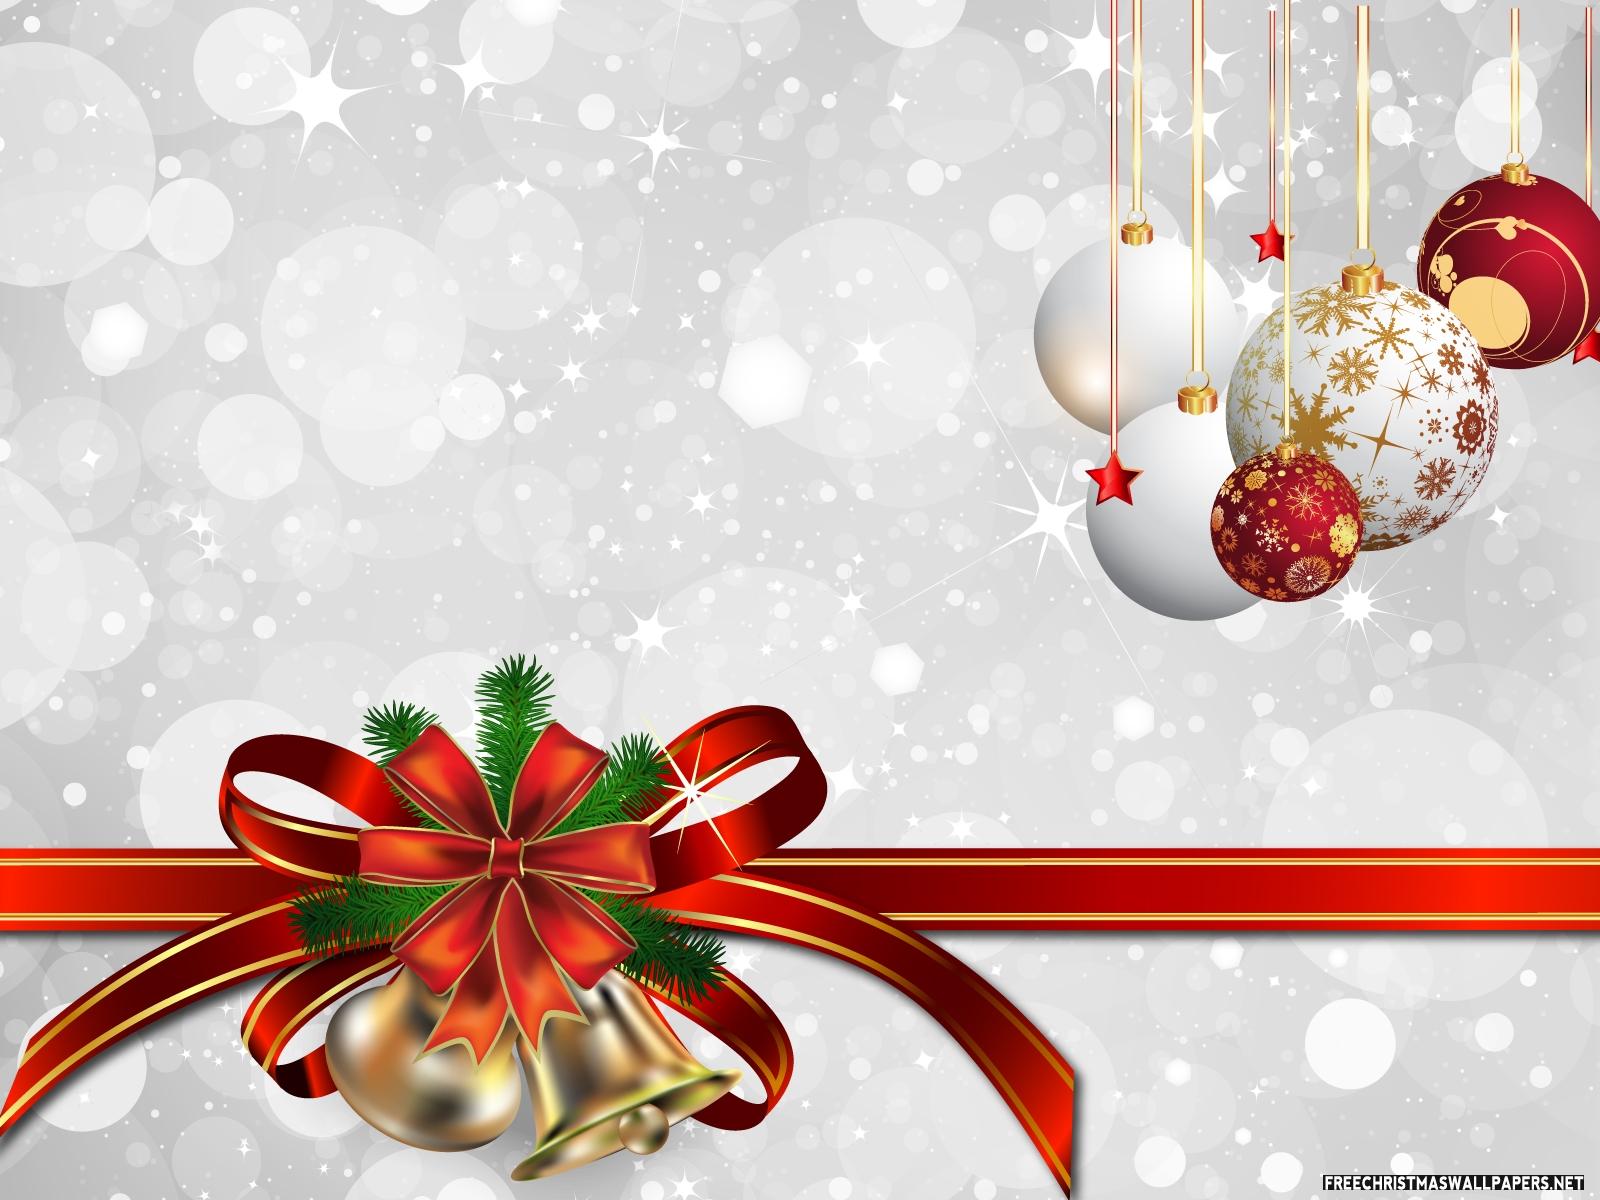 hd christmas wallpapers 18 - Free Christmas Images